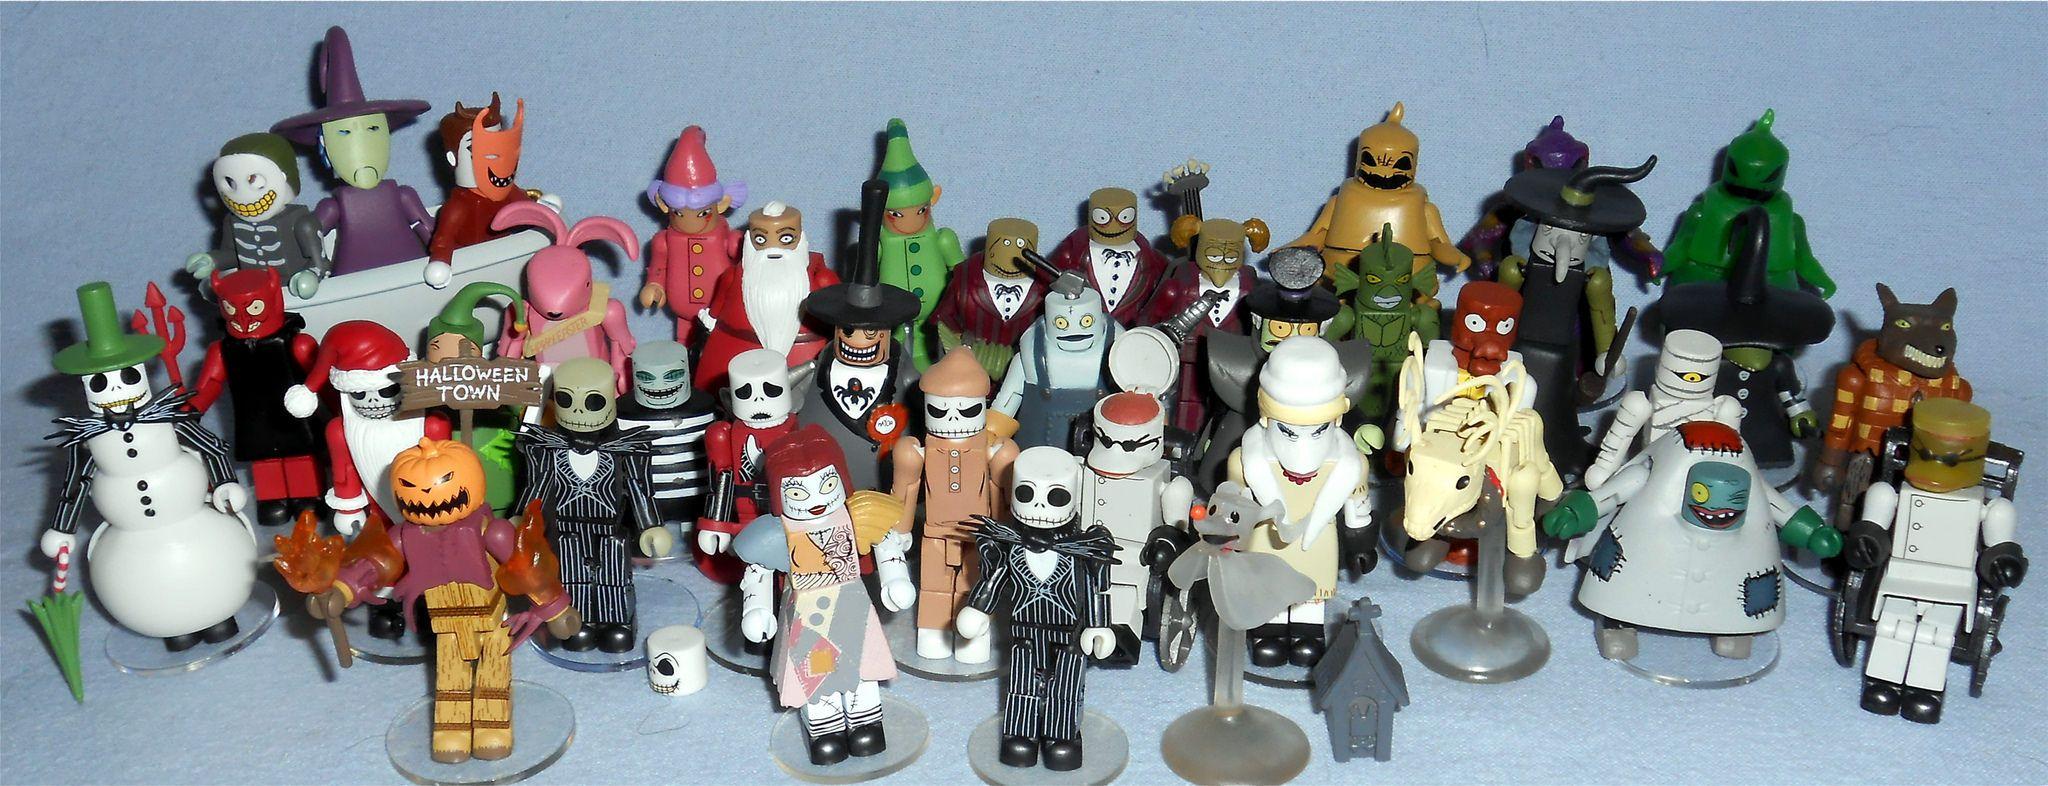 TV, Movie & Video Games Nightmare Before Christmas Minimates Blind Bag Series 3 Pajama Jack Skellington